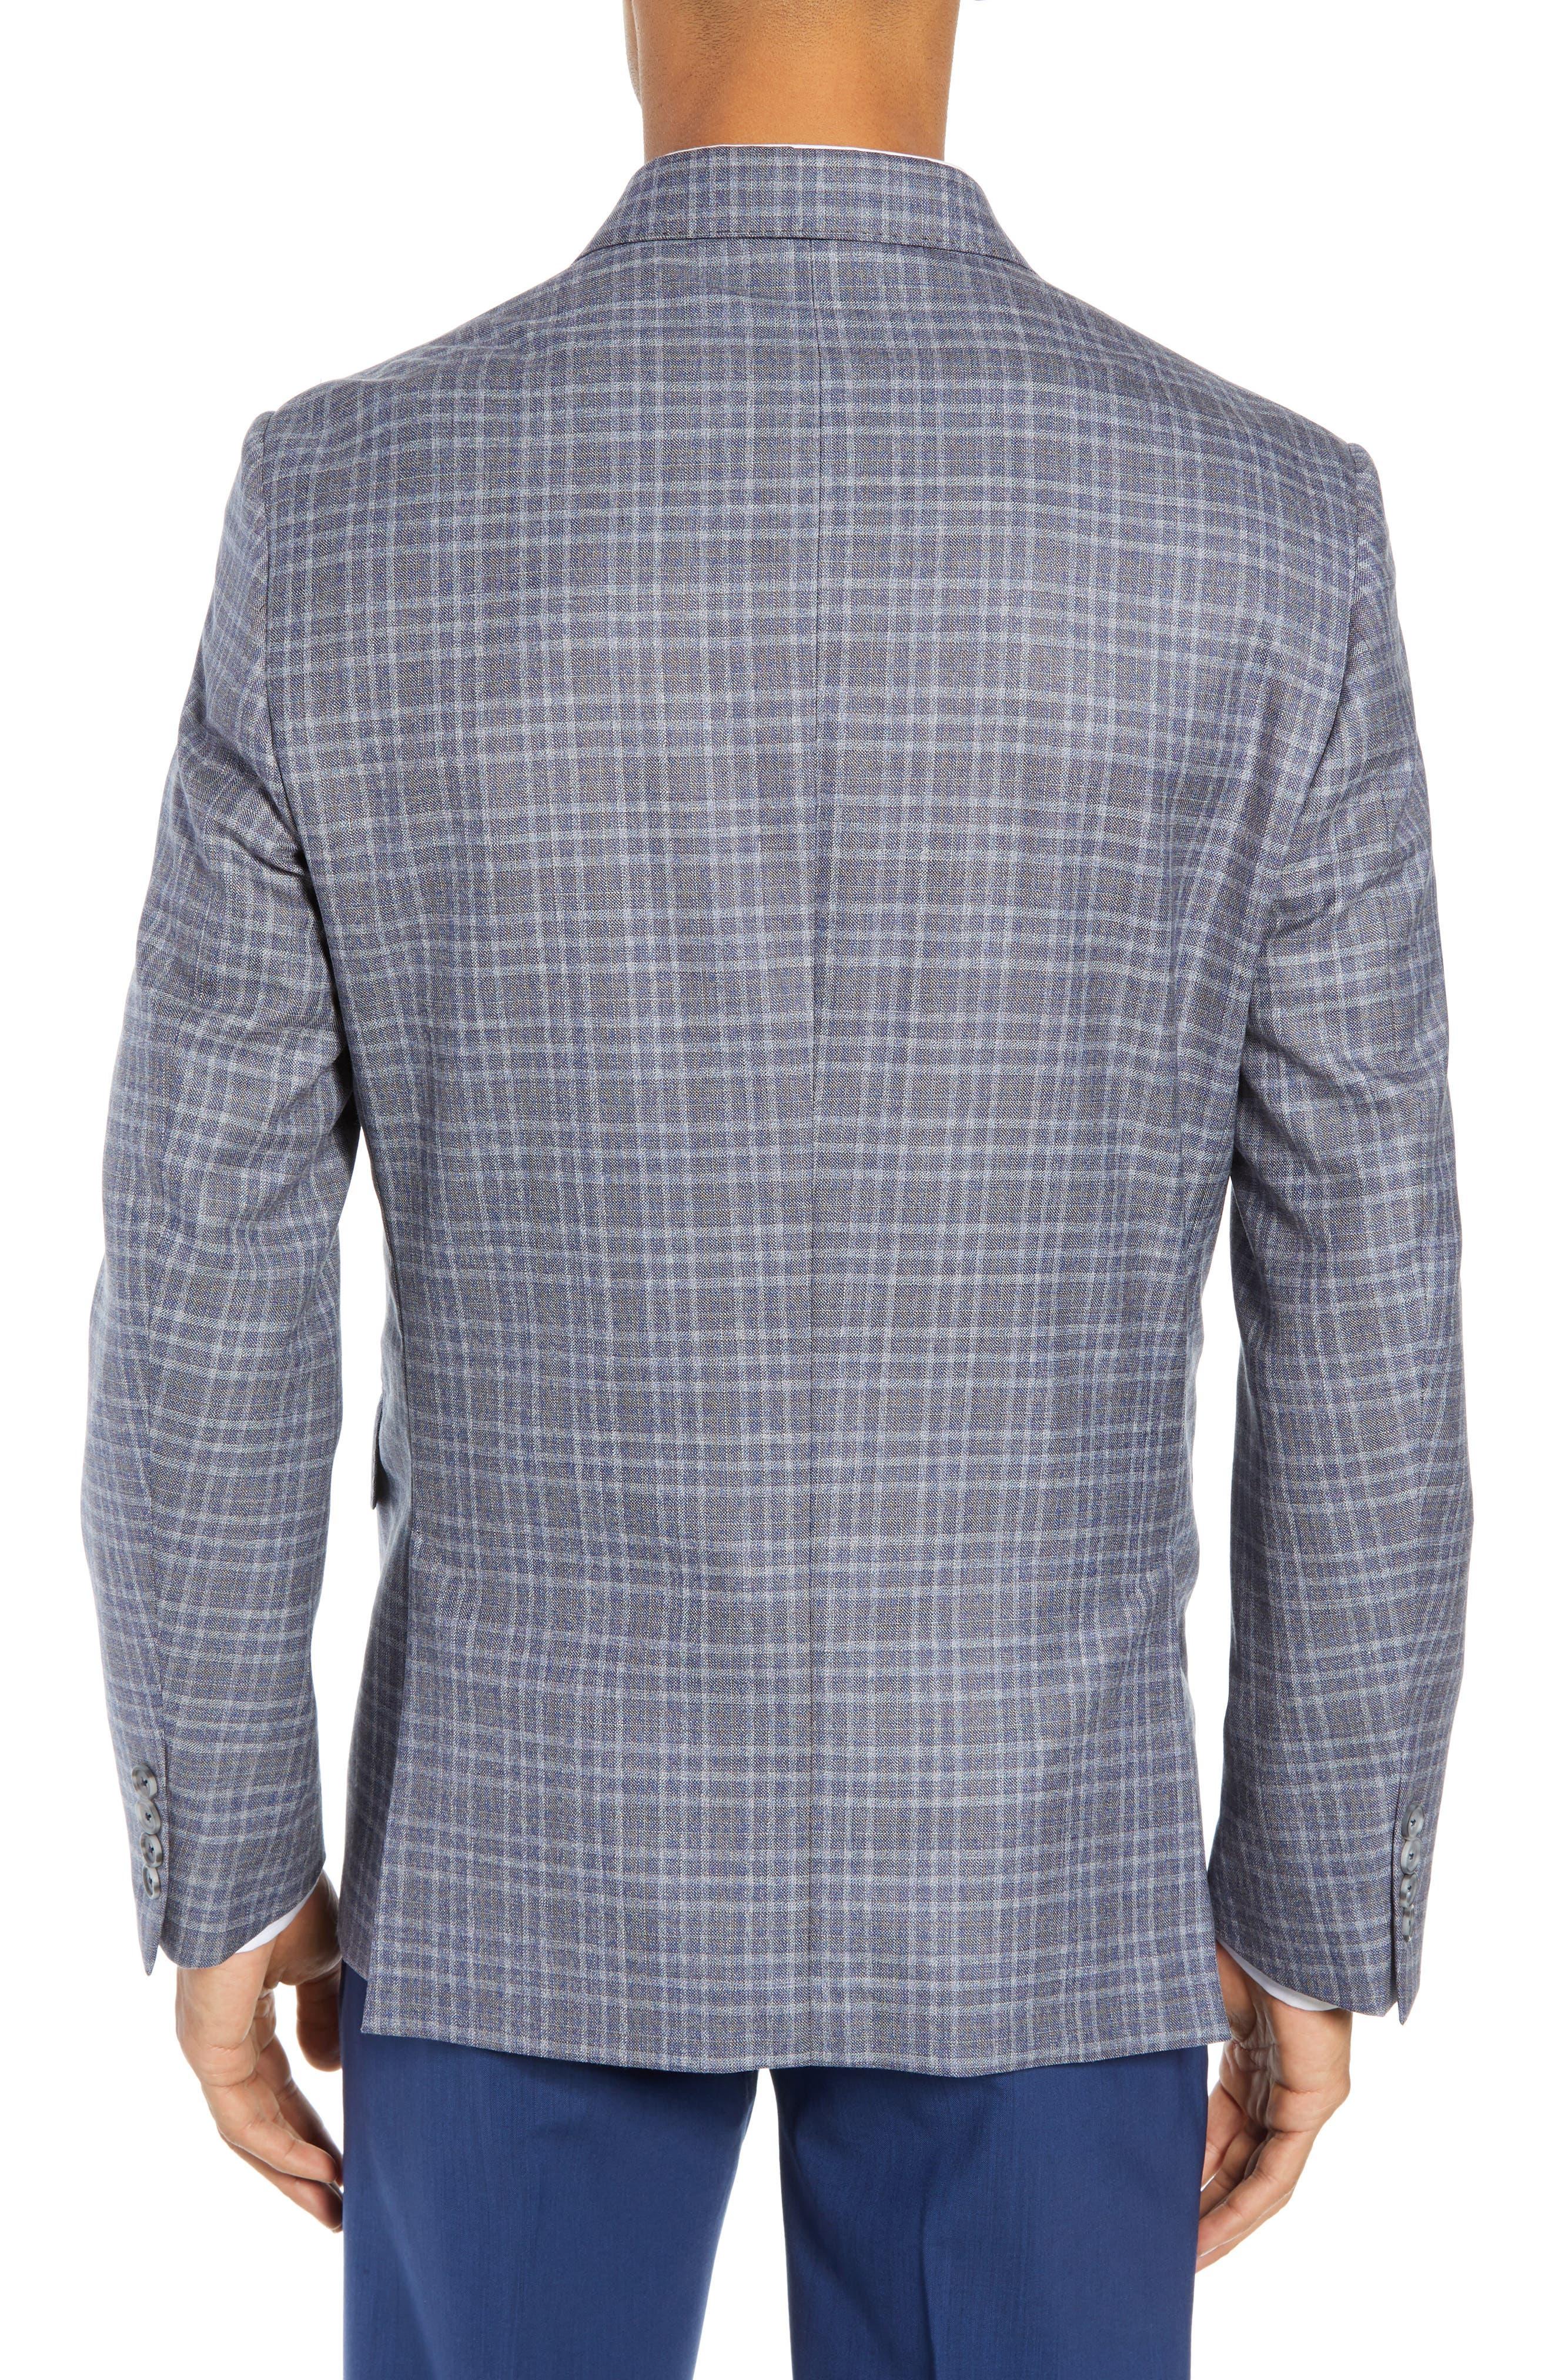 JOHN W. NORDSTROM<SUP>®</SUP>, Classic Fit Plaid Wool Sport Coat, Alternate thumbnail 2, color, 420